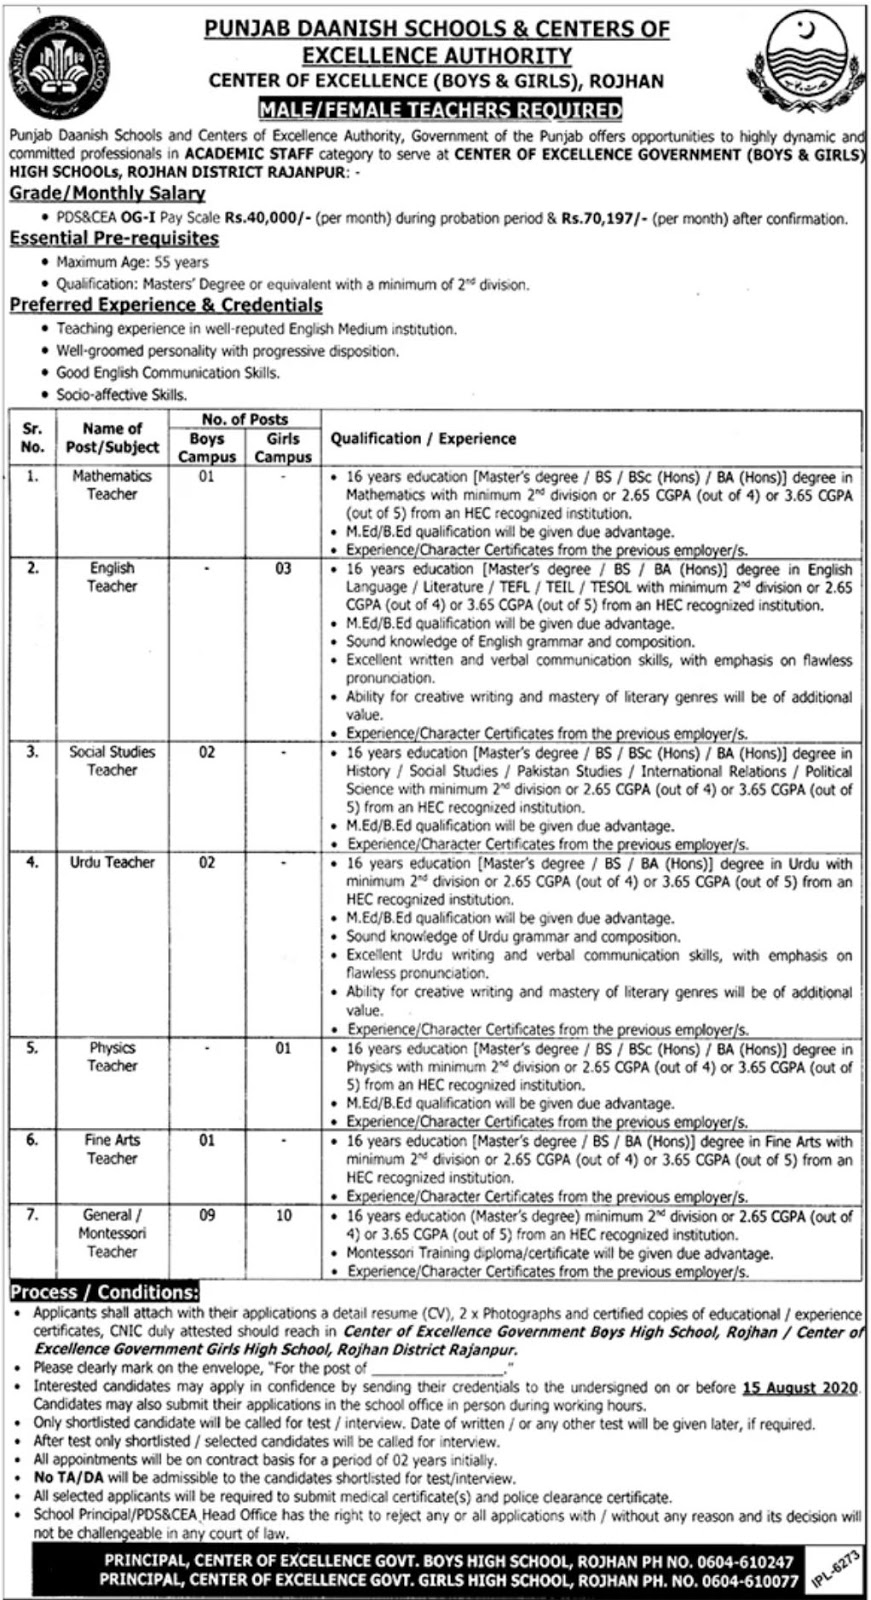 Punjab Daanish Schools Jobs July 2020 – Teaching jobs